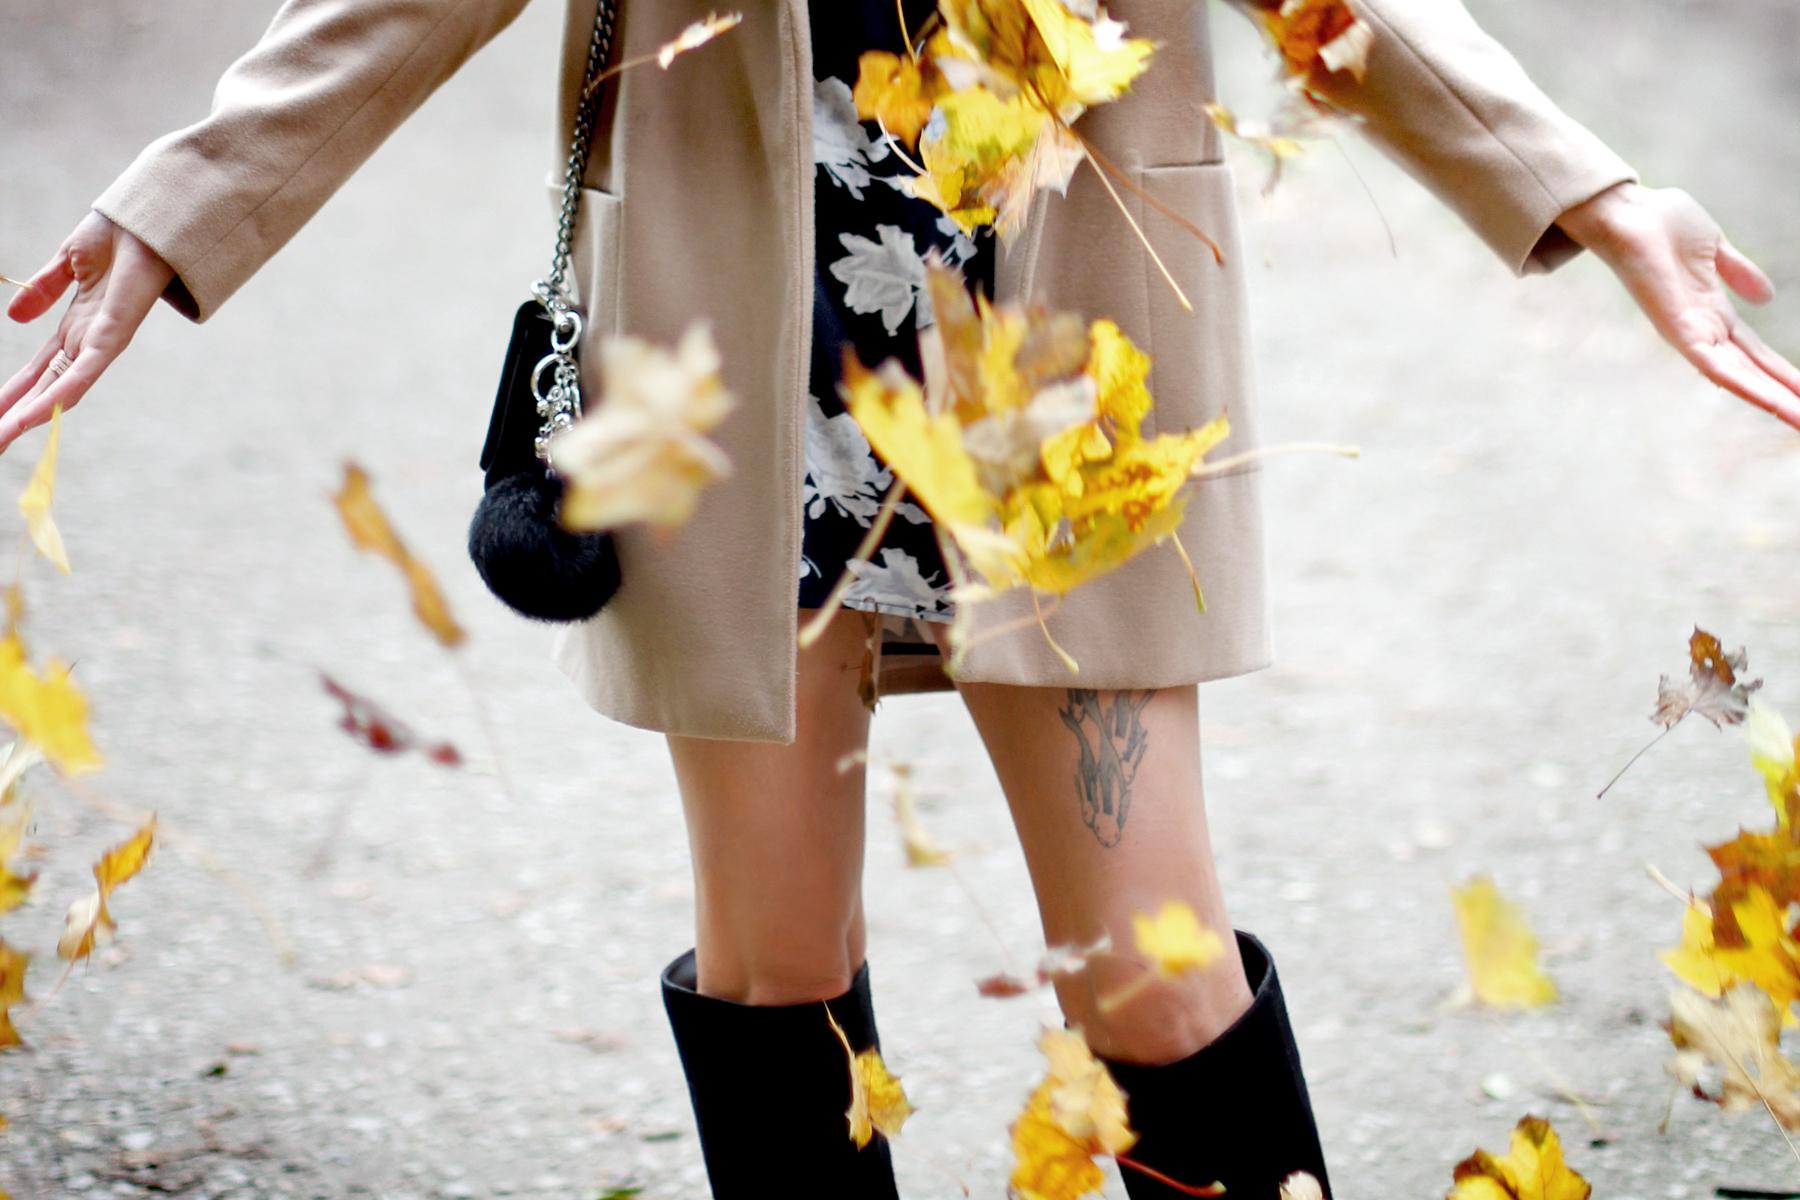 autumn twirl fun girl vintage leaves yellow fall fun darling girl boots mini dress happy monday cats & dogs wie hund und katze modeblog fashionblogger ricarda schernus styleblog ootd berlin hannover düsseldorf 1